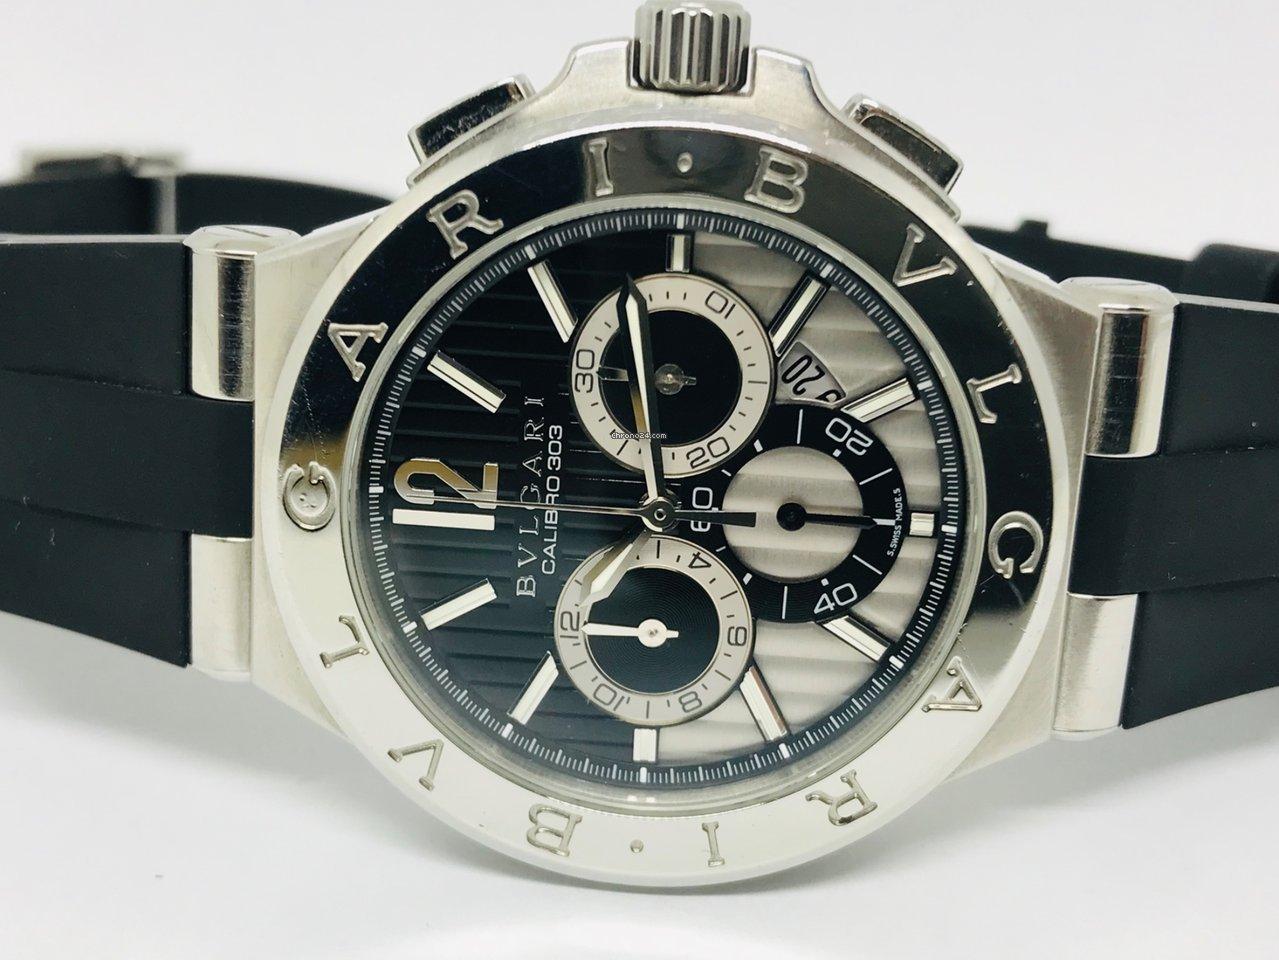 e3e8ae784817 Bulgari Diagono Chronograph Calibre 303 for  4,138 for sale from a Trusted  Seller on Chrono24